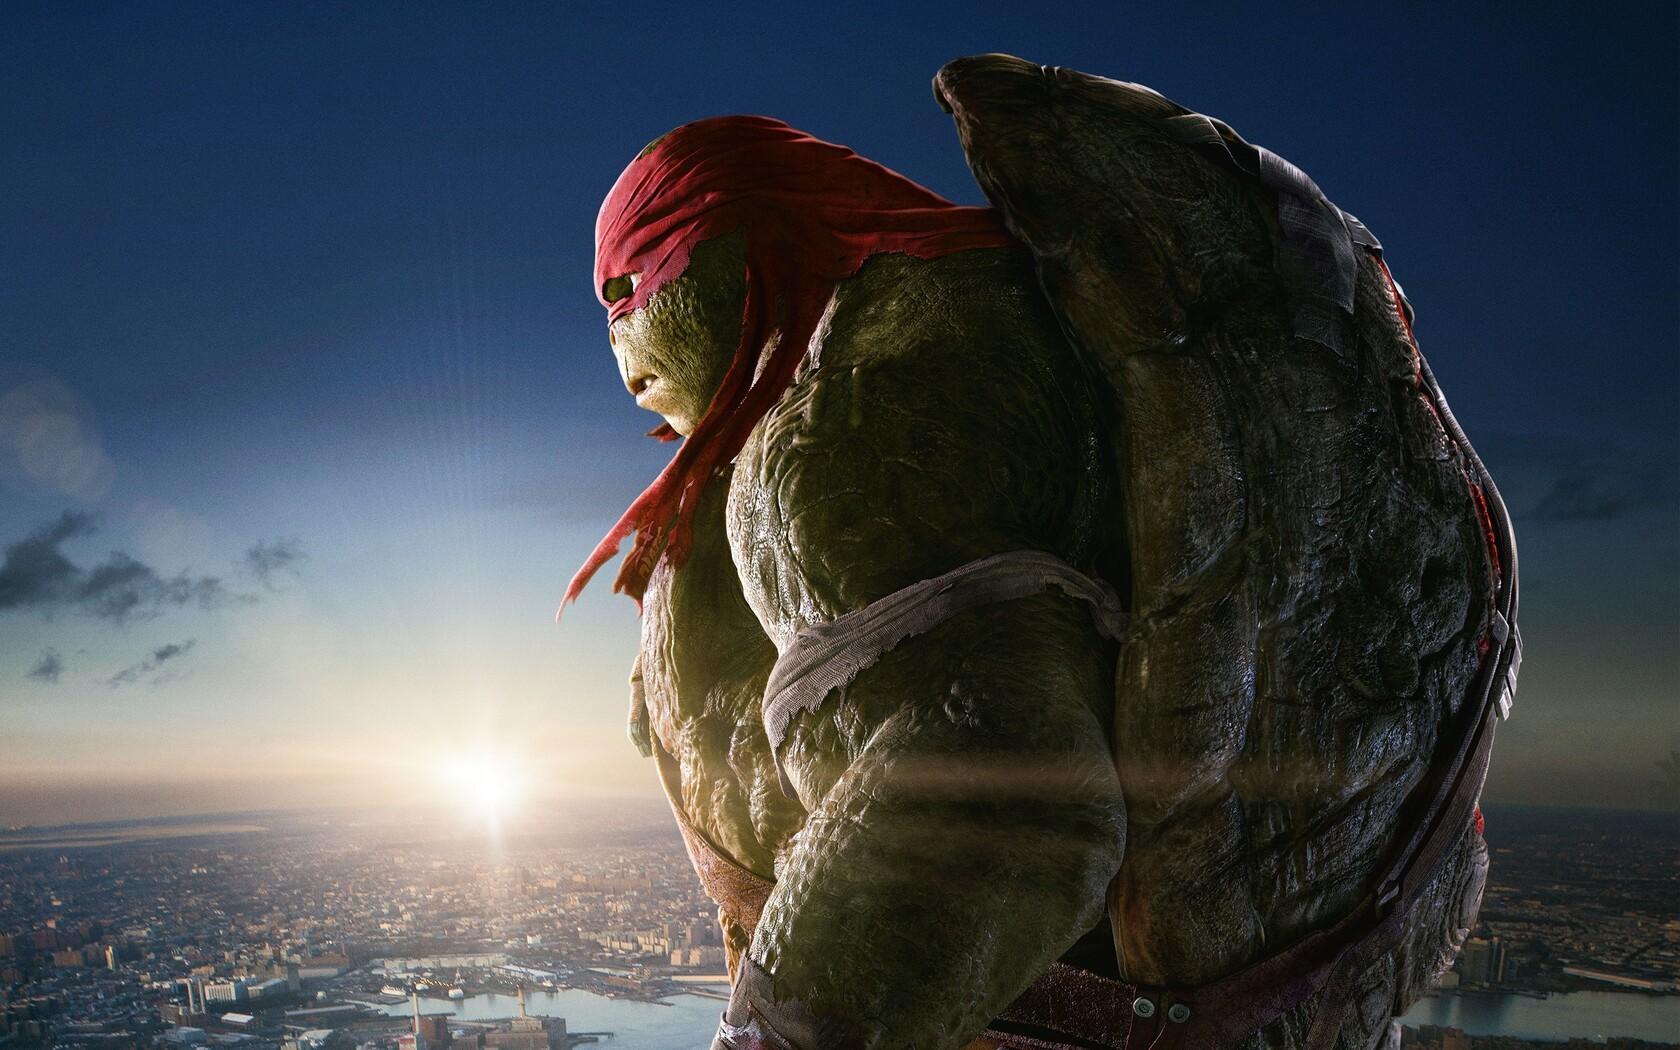 1680x1050 Raphael In Teenage Mutant Ninja Turtles 1680x1050